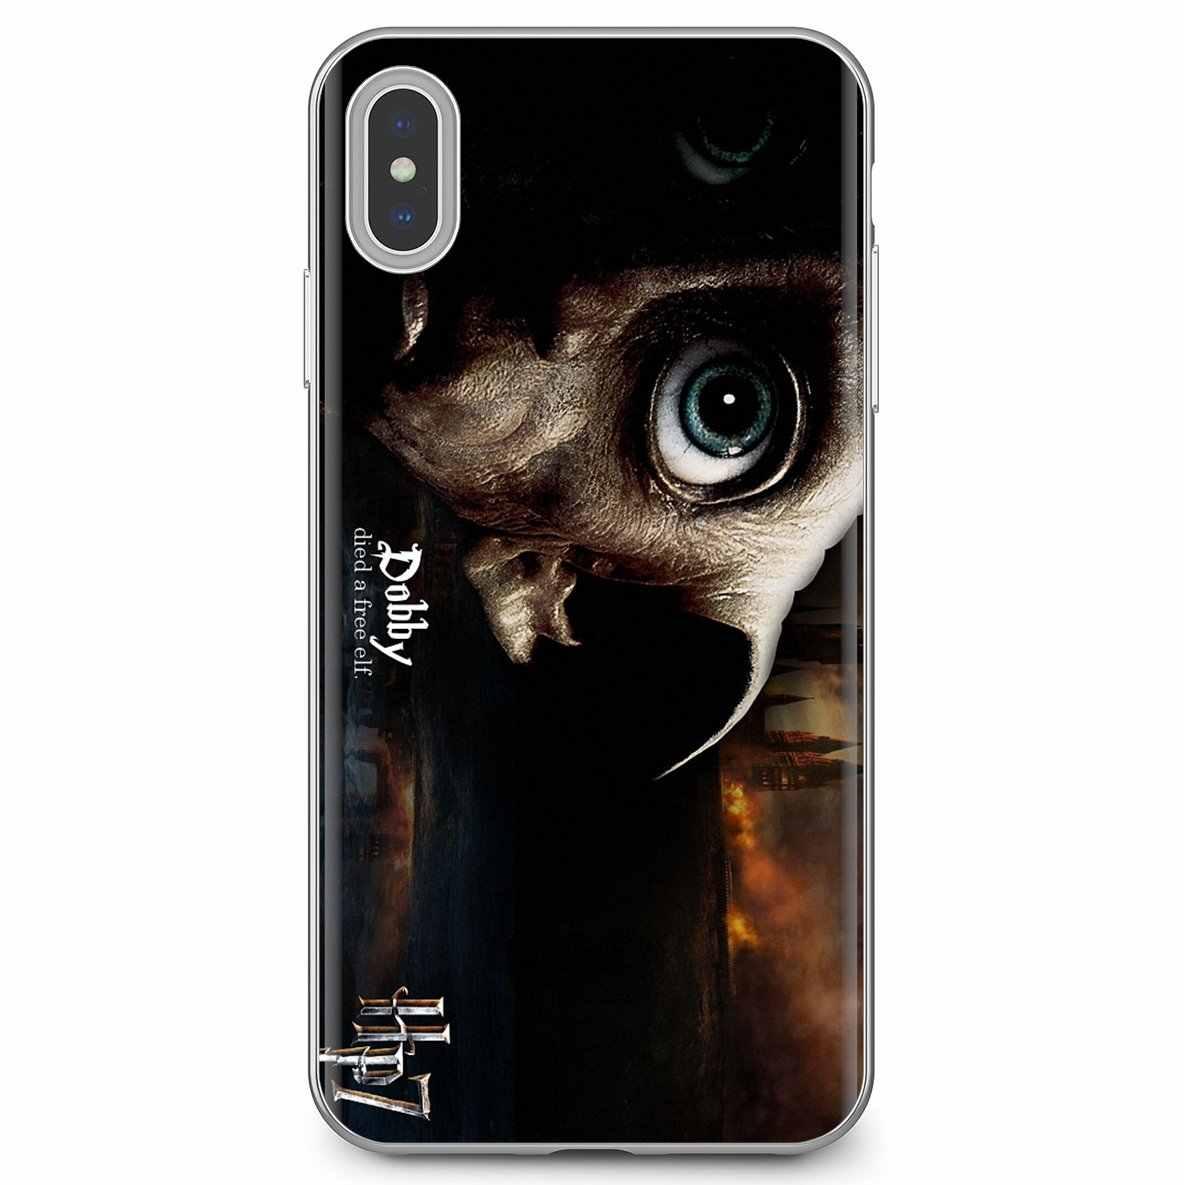 Für Huawei G7 G8 P7 P8 P9 P10 P20 P30 Lite Mini Pro P Smart 2017 2018 2019 Dünne Silikon weiche TPU Telefon Fall Film Dobby Poster